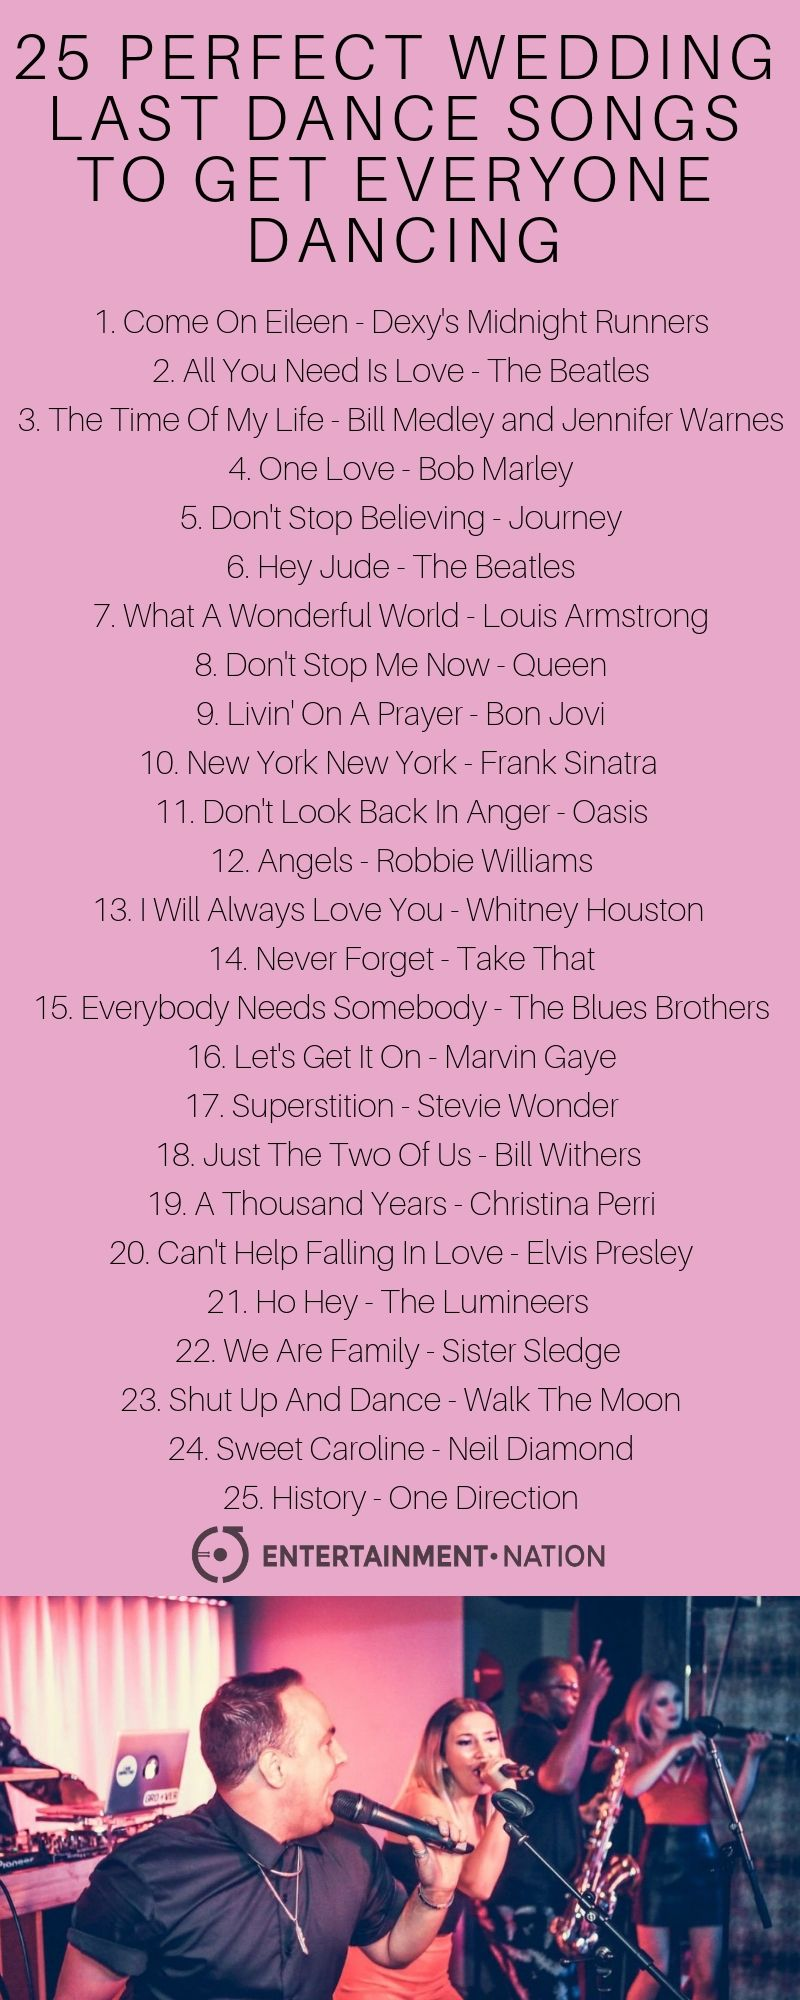 25 Perfect Wedding Last Dance Songs To Get Everyone Dancing